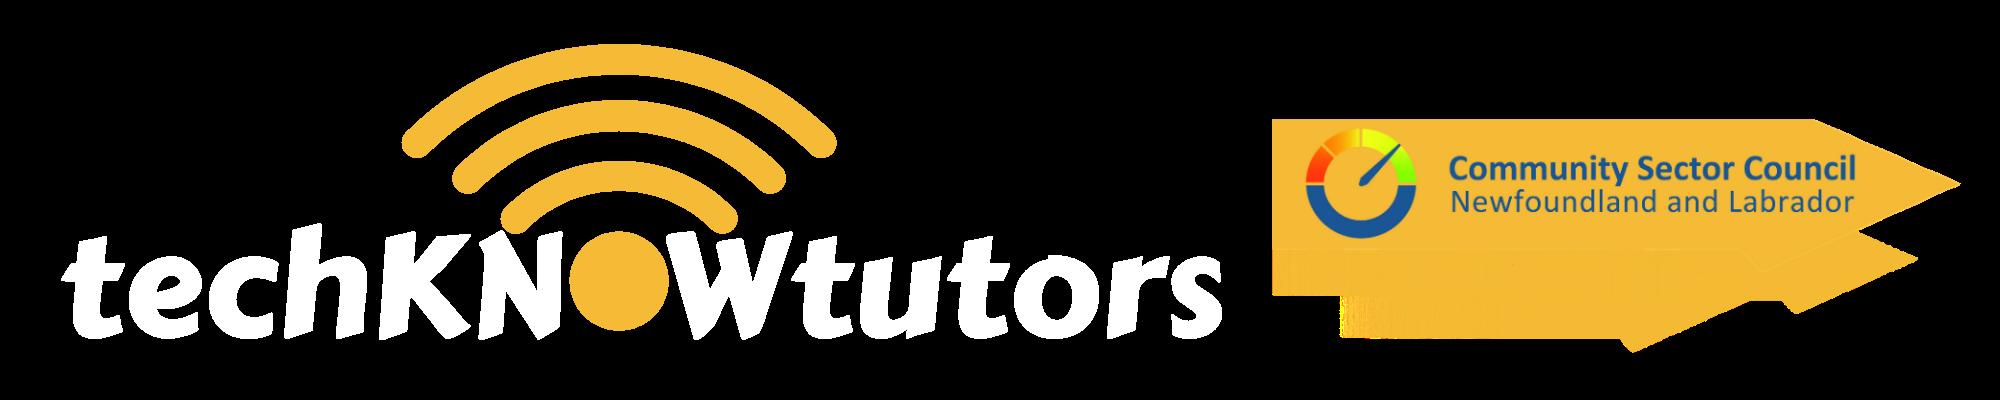 techKNOWtutors